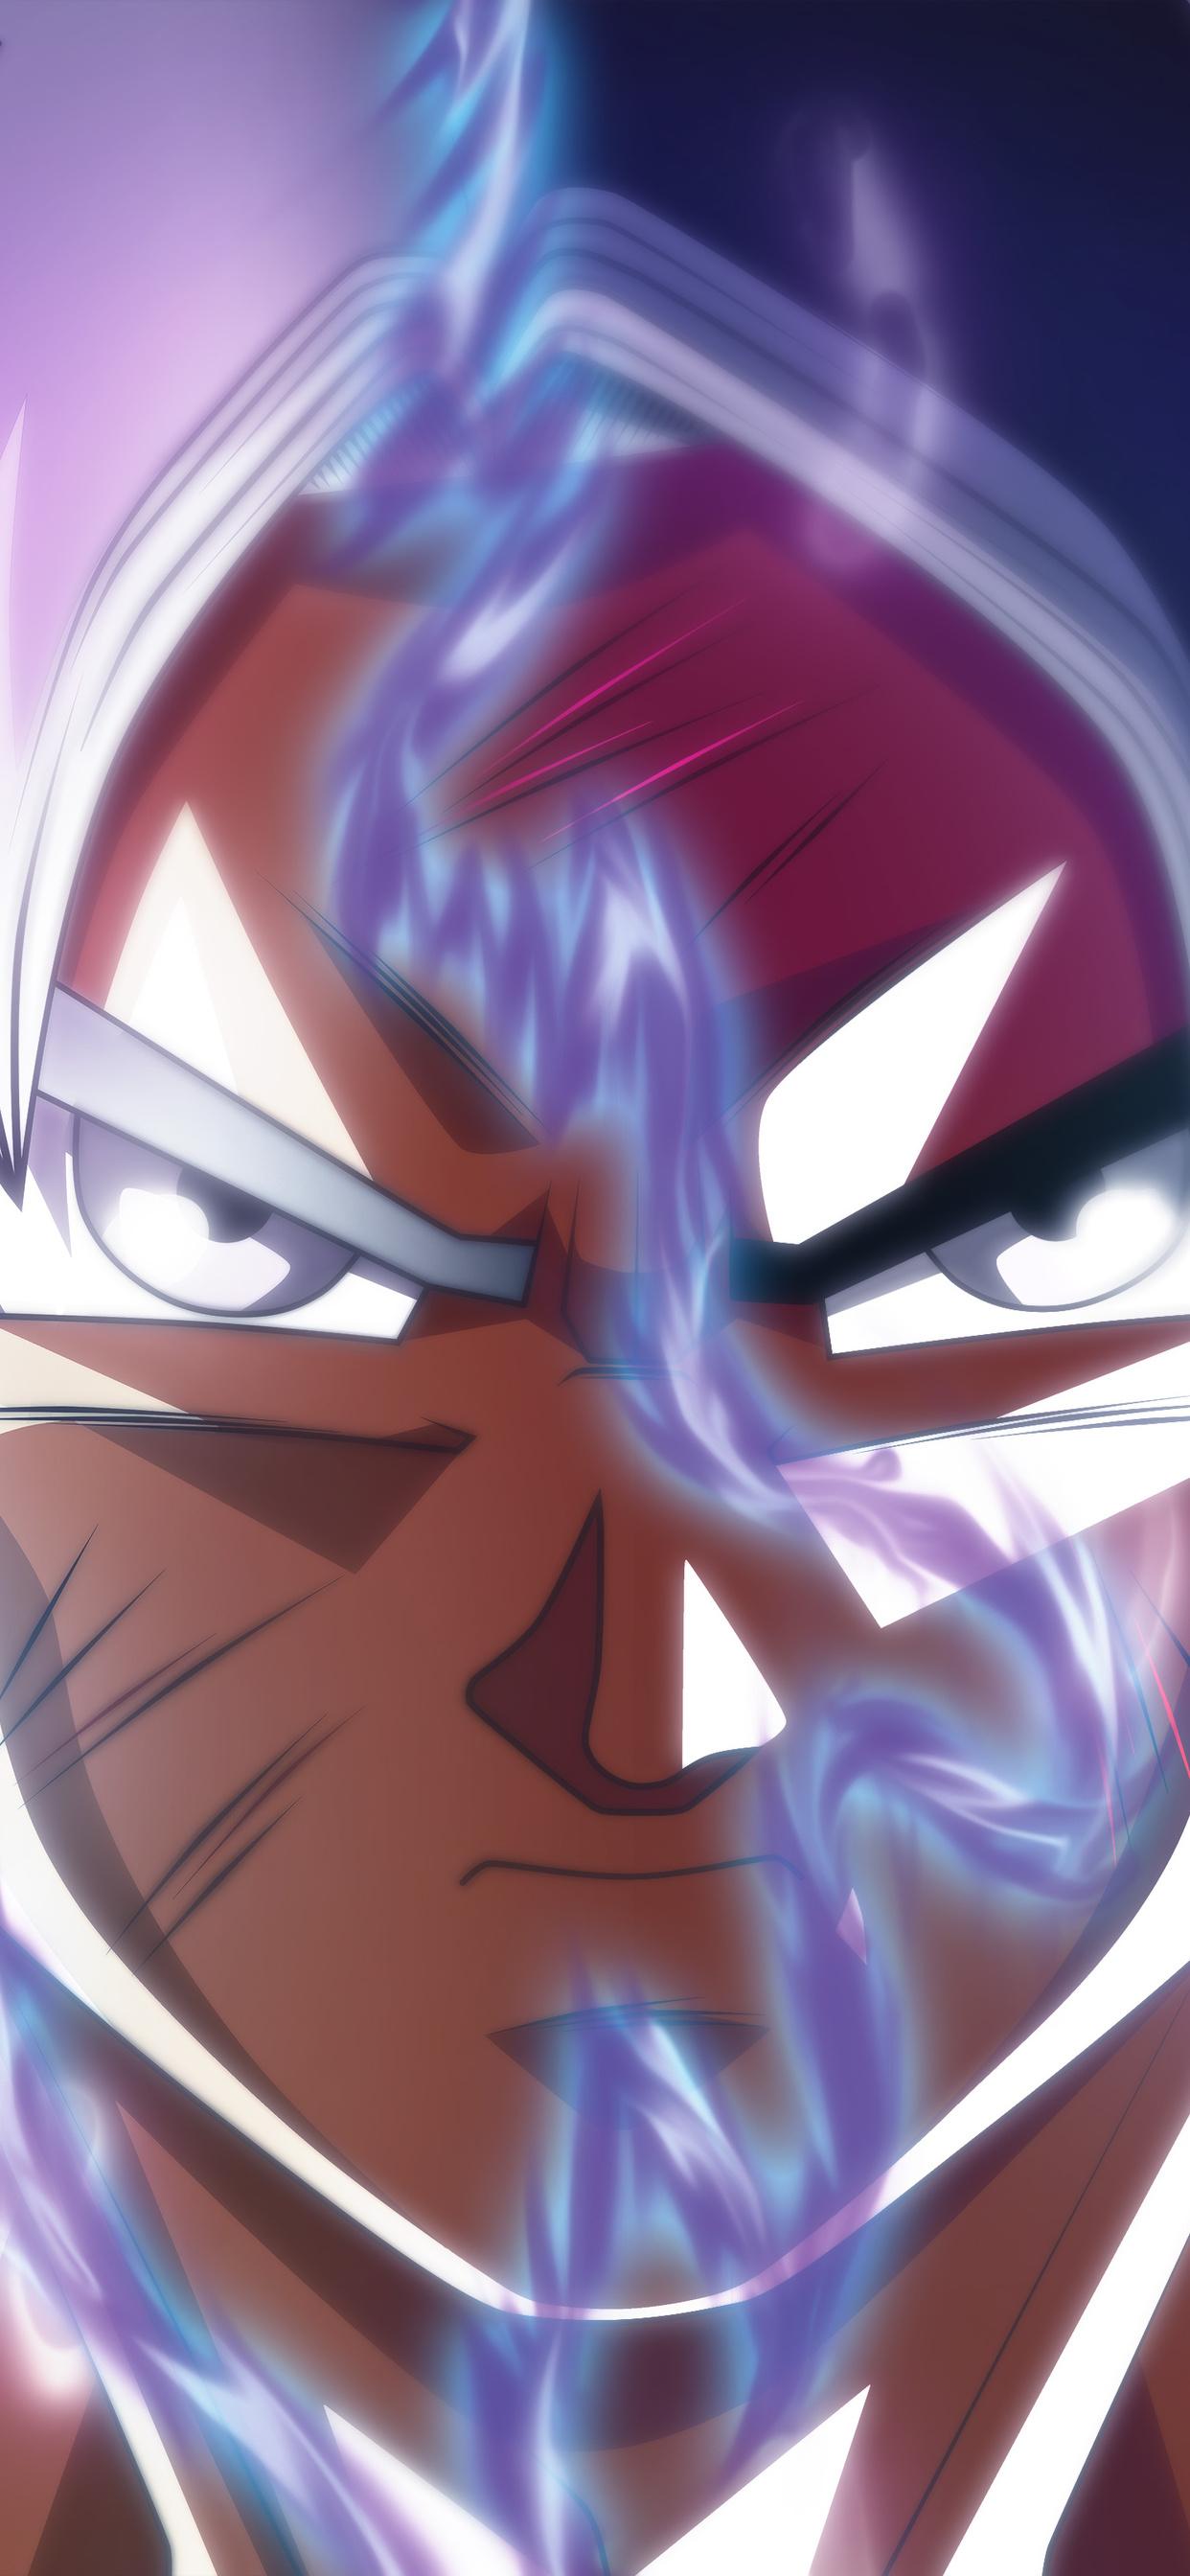 1242x2688 Goku Ultra Instinct Transformation Iphone Xs Max